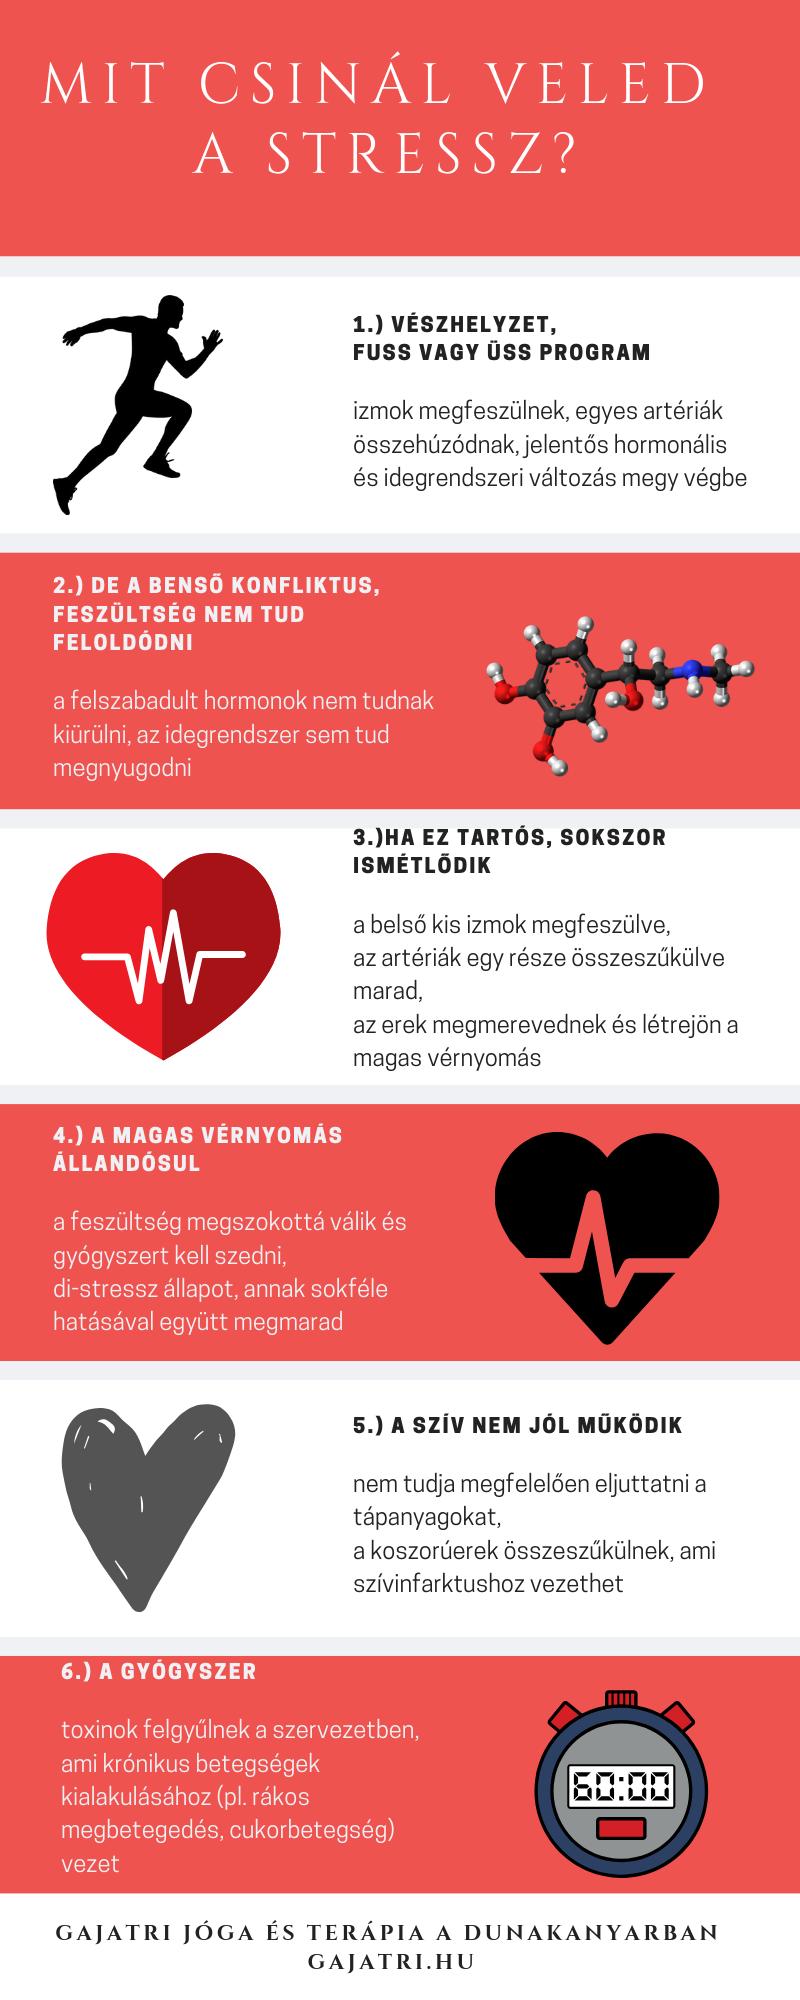 5 komponens tinktúrája magas vérnyomás esetén)